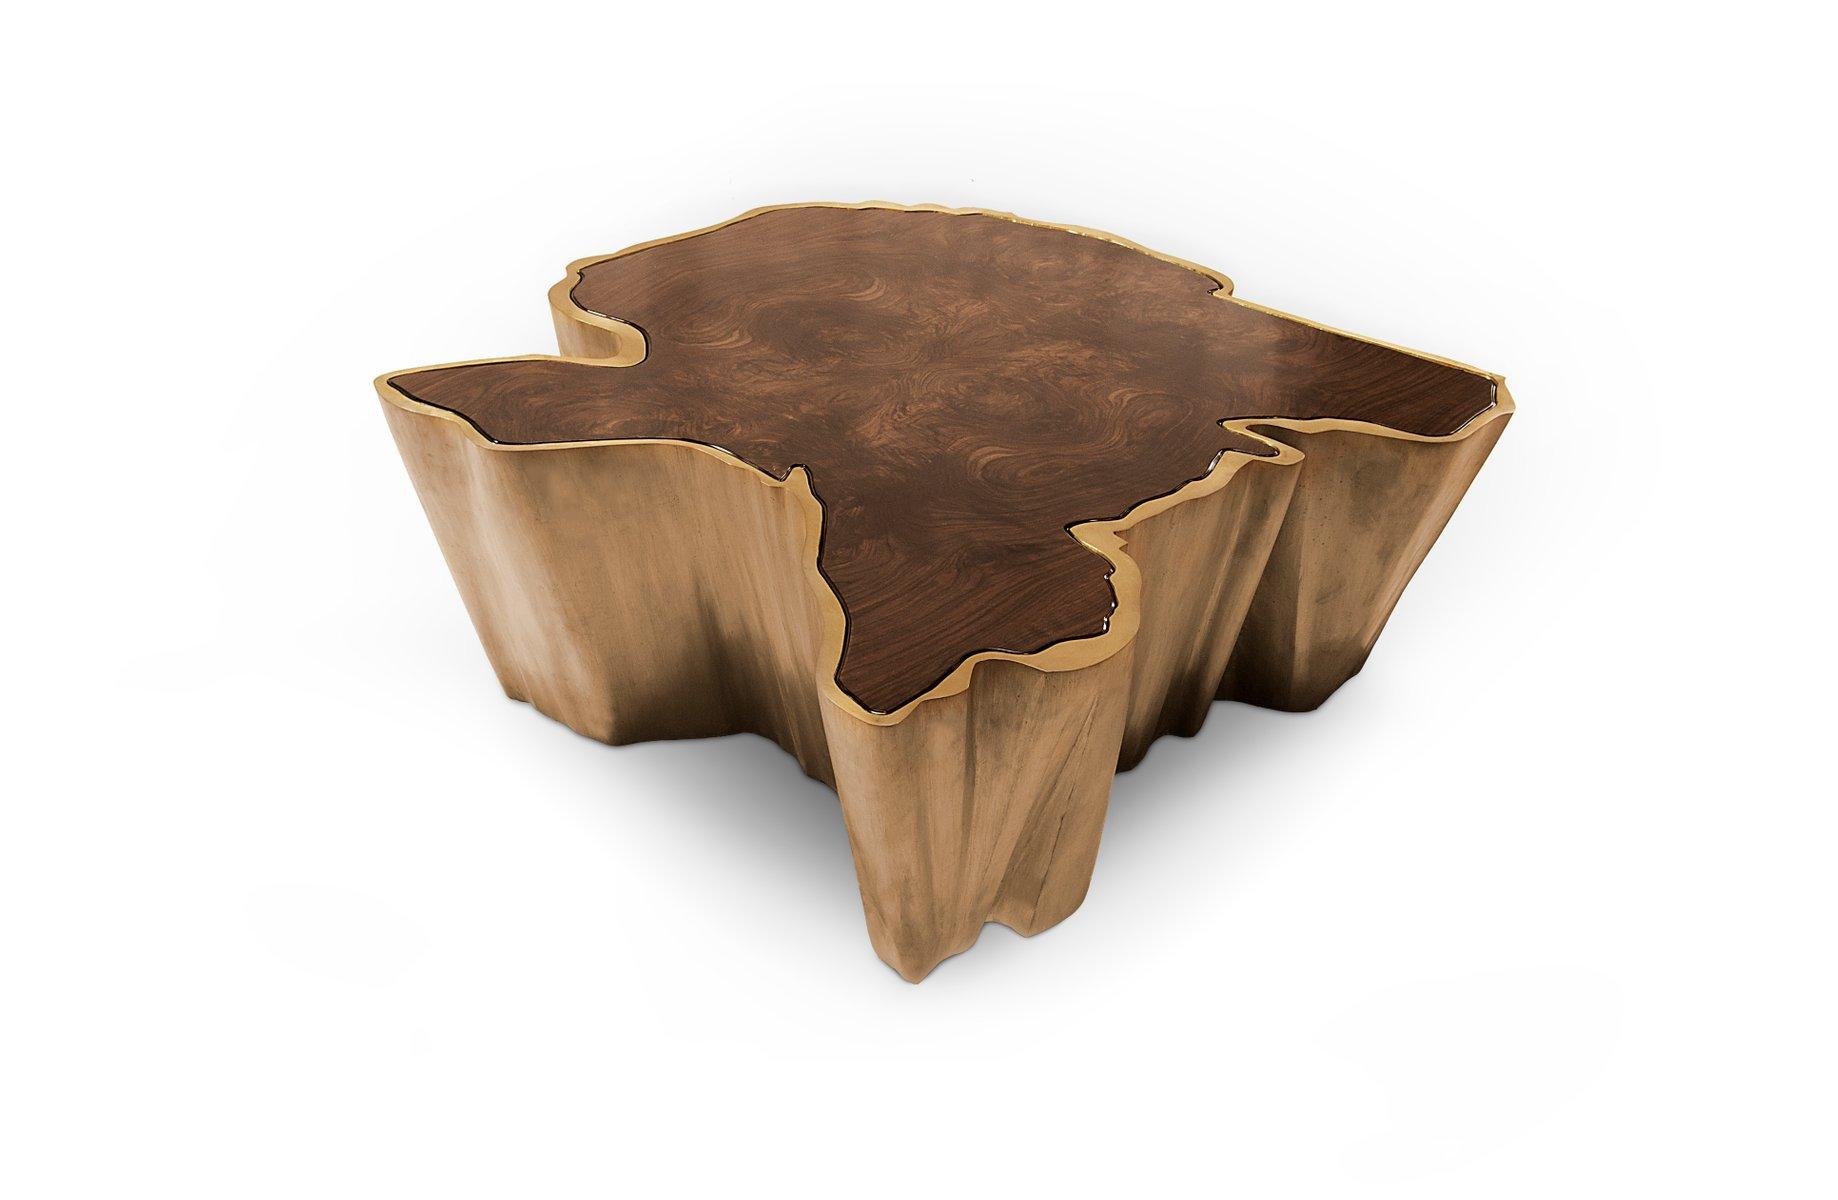 Sequoia Tisch von Covet Paris